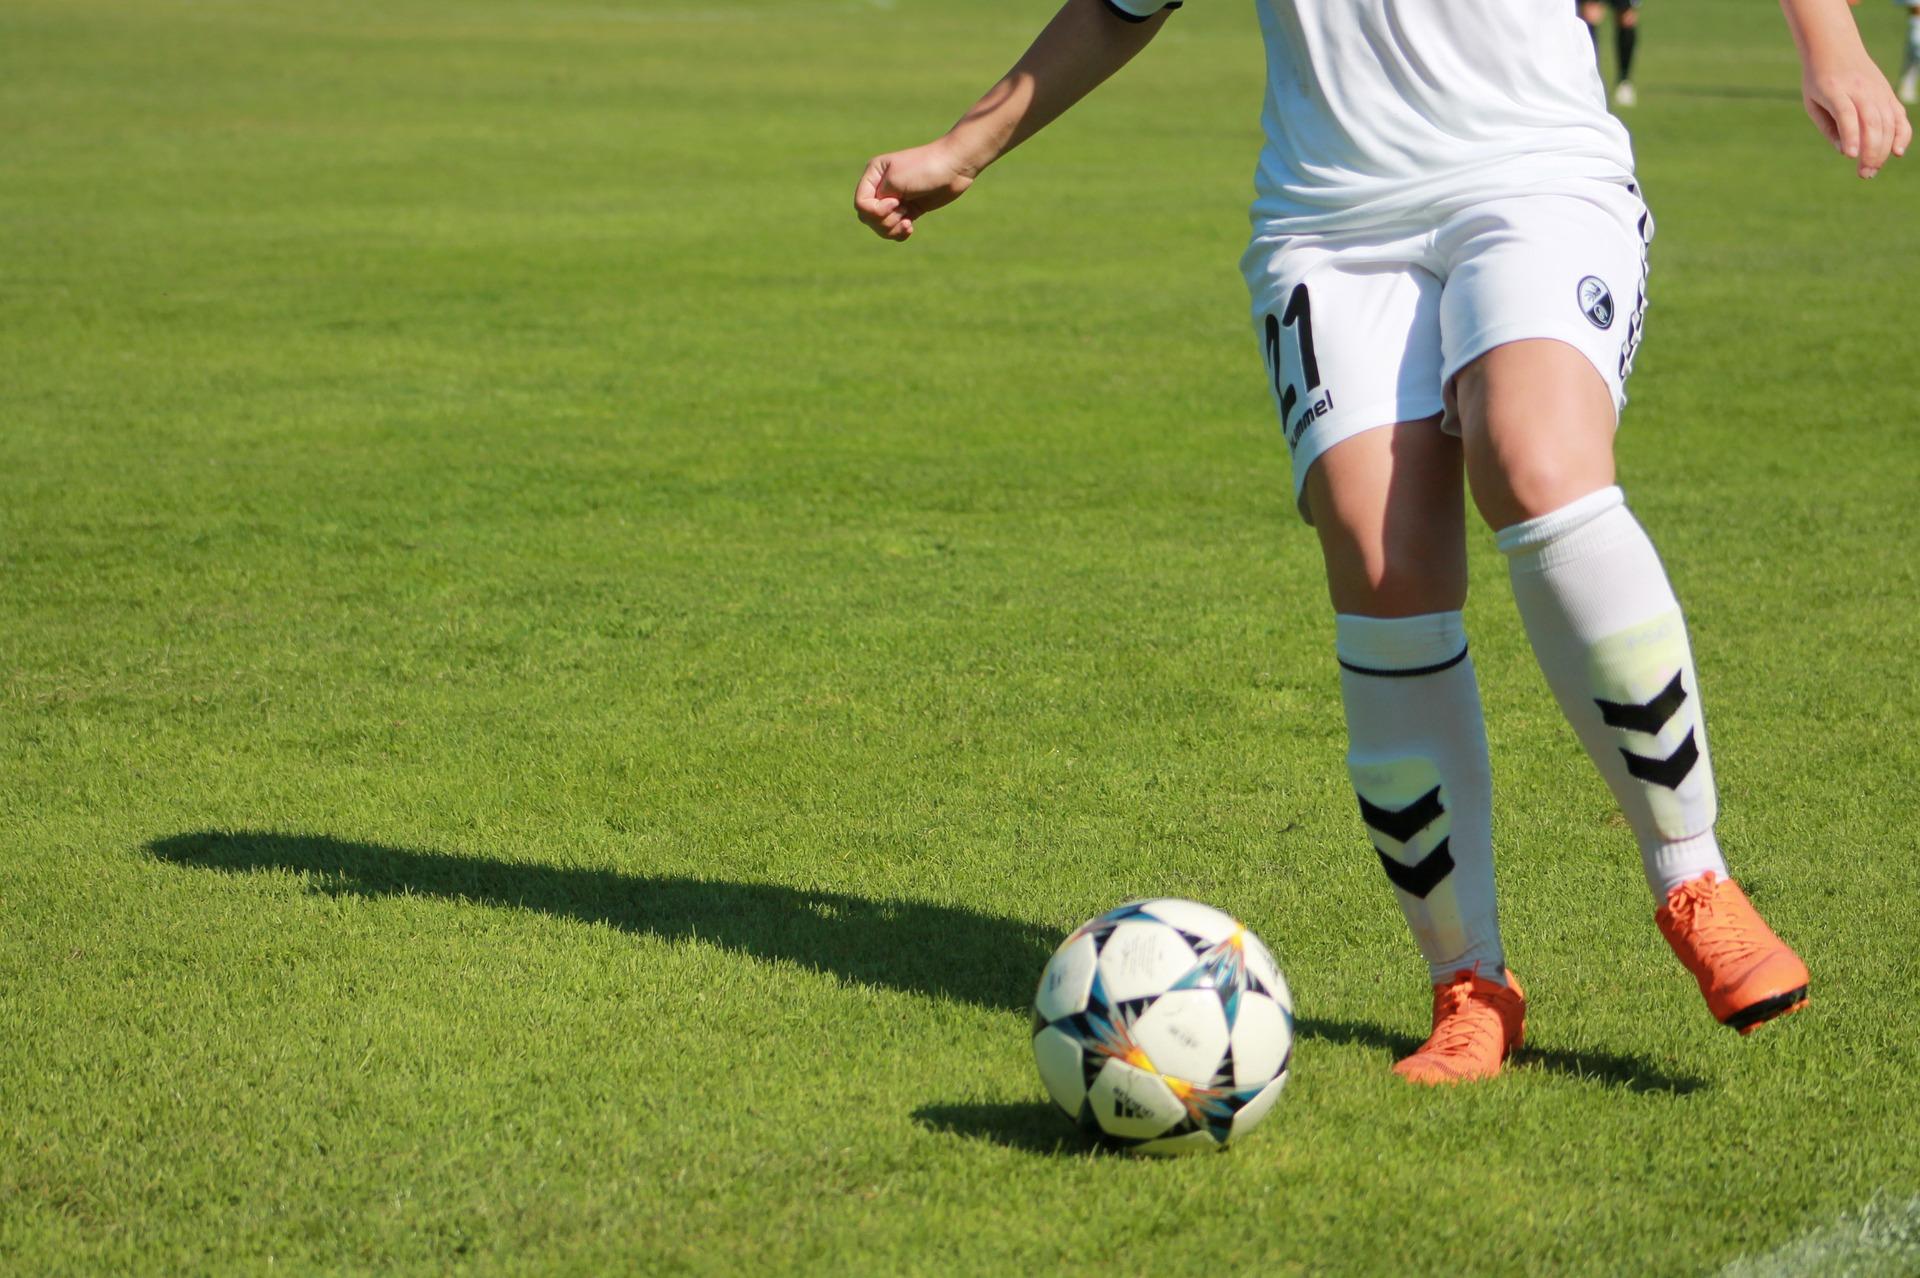 liga femenina de futbol